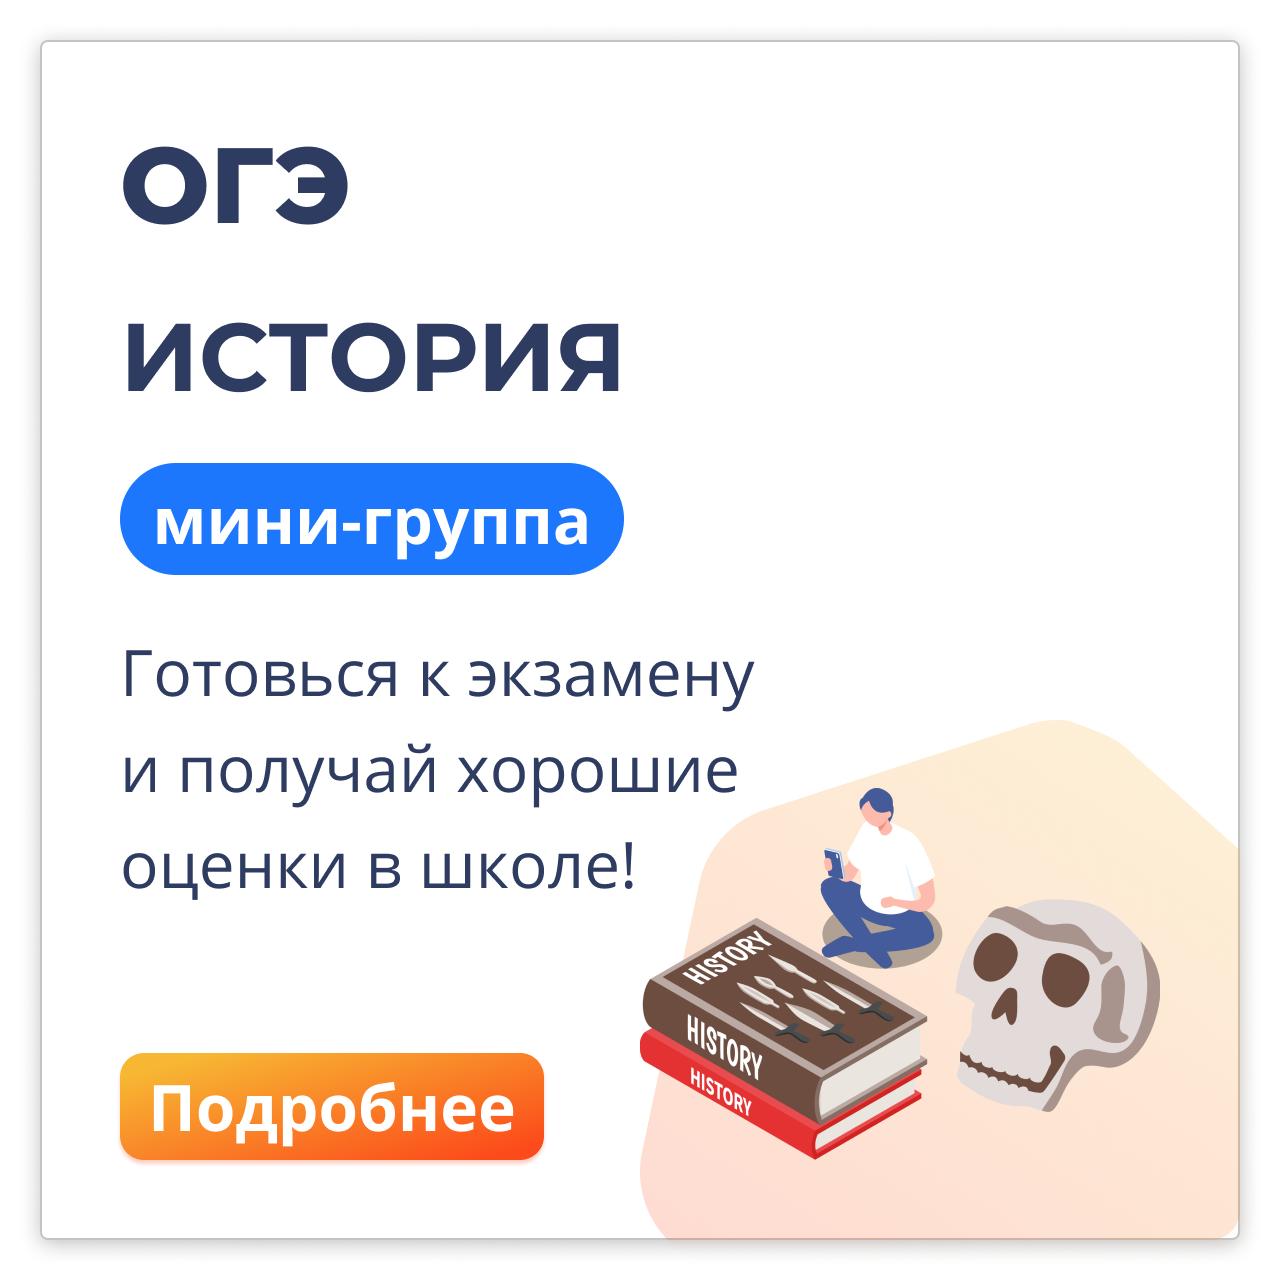 История ОГЭ Онлайн мини-группа